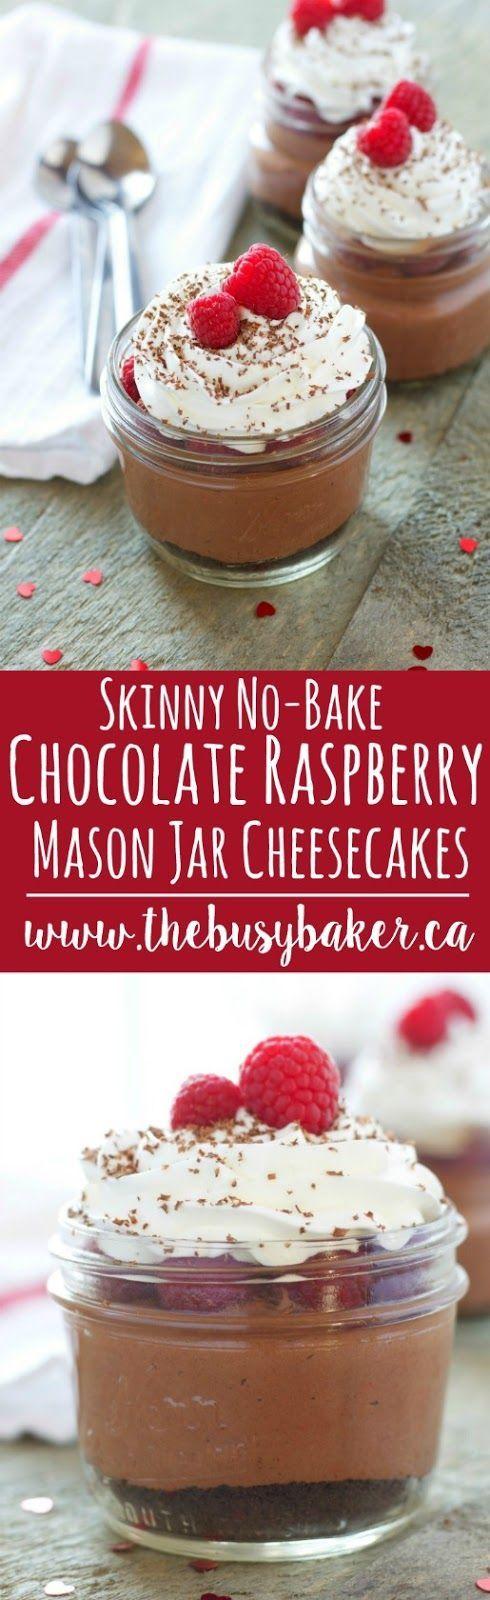 Mason jar cheesecake, Cheesecake recipes and Raspberries on Pinterest